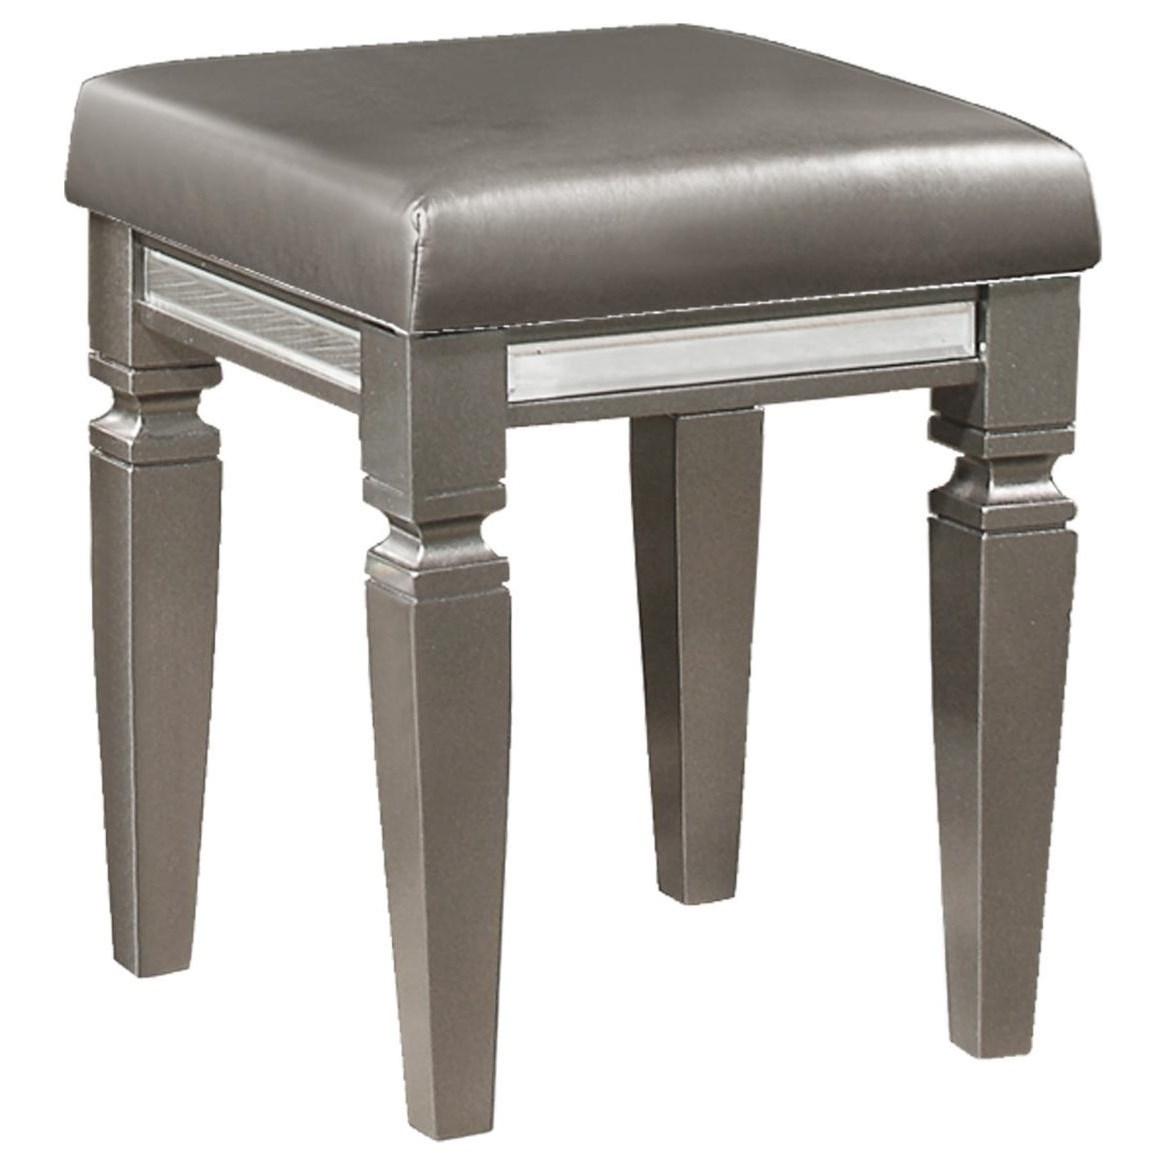 Tamsin Vanity Stool by Homelegance at Beck's Furniture